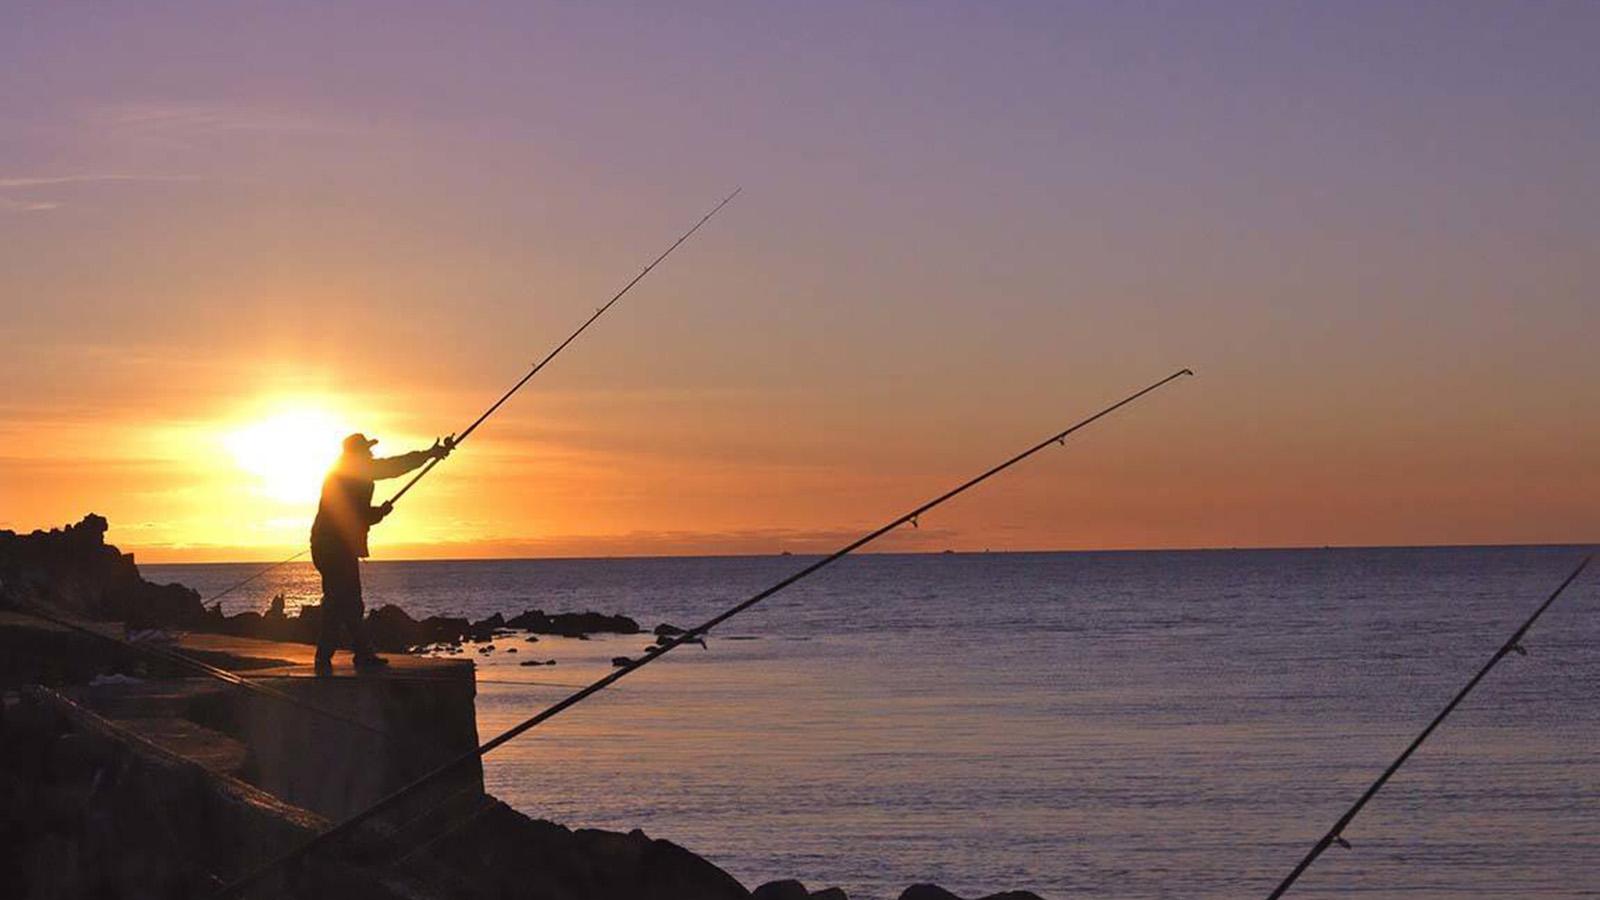 Fishing, Mornington Peninsula, Victoria, Australia